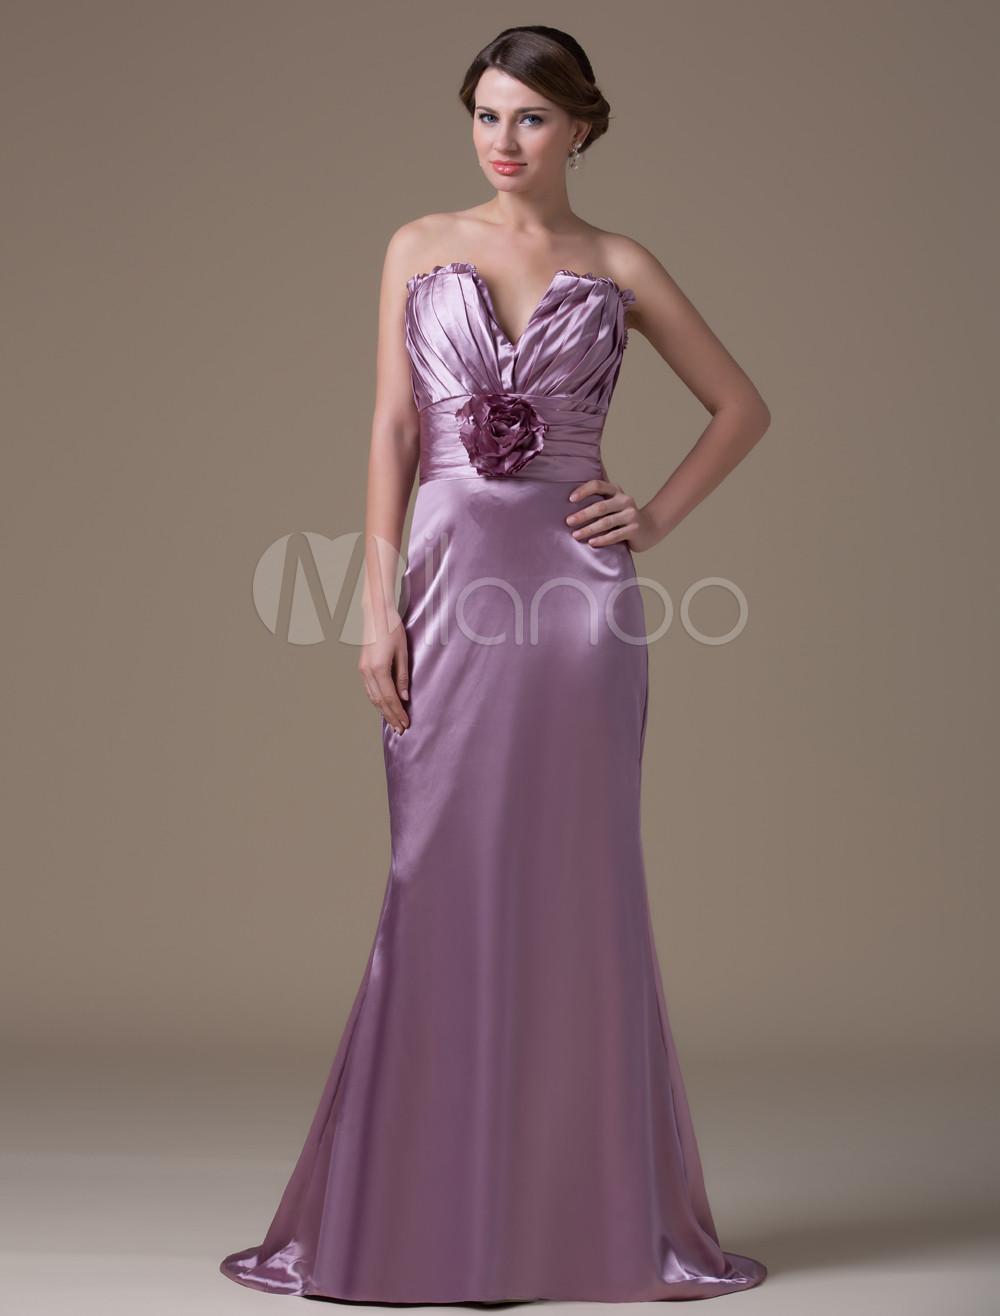 Light Purple Fashion A-line Spandex Satin Maternity Bridesmaid Dress